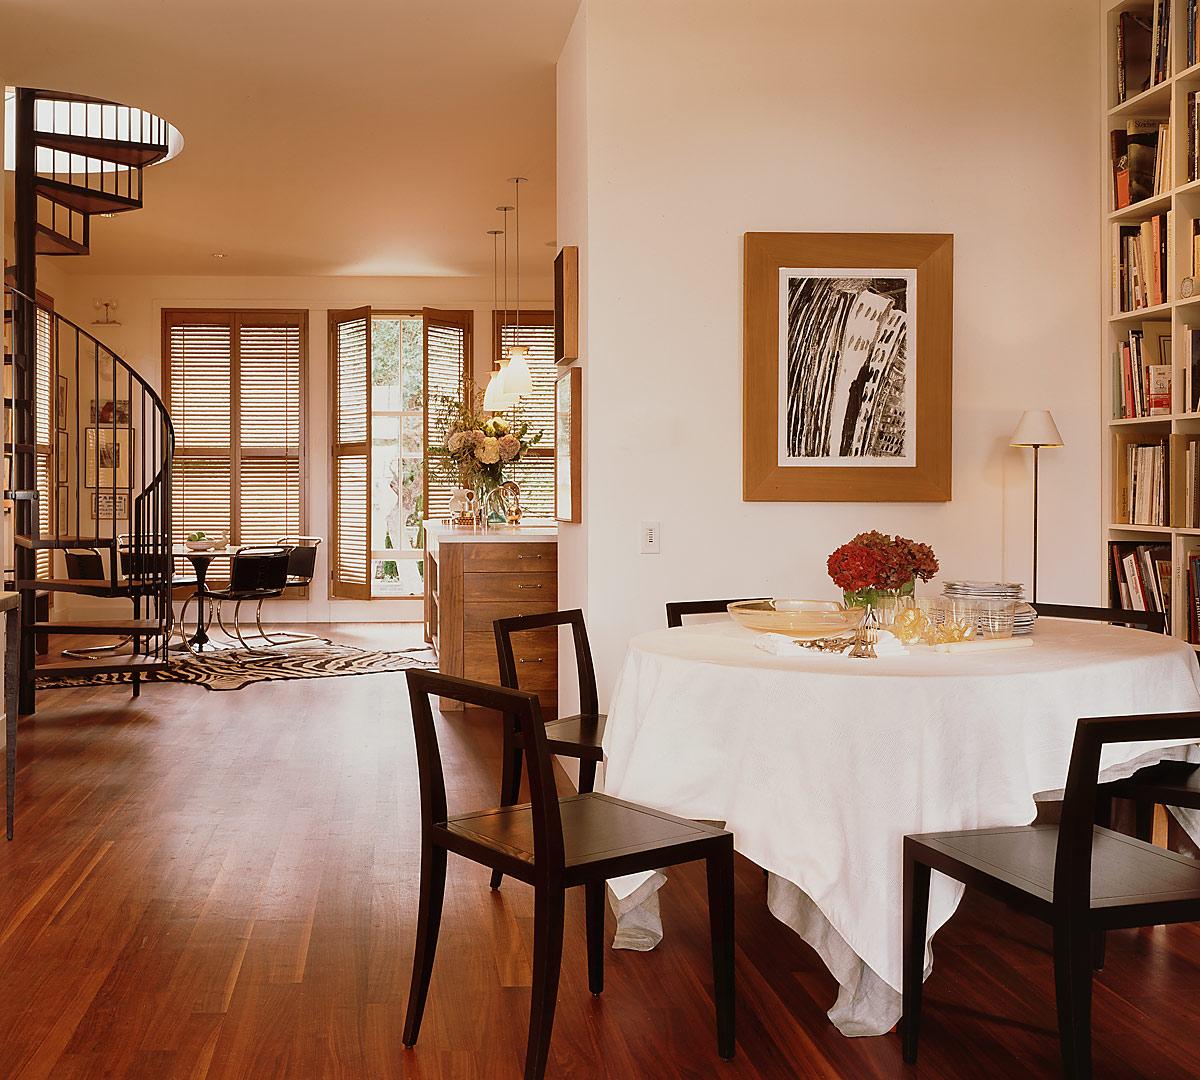 Cumberland San Francisco - interior design by BAMO